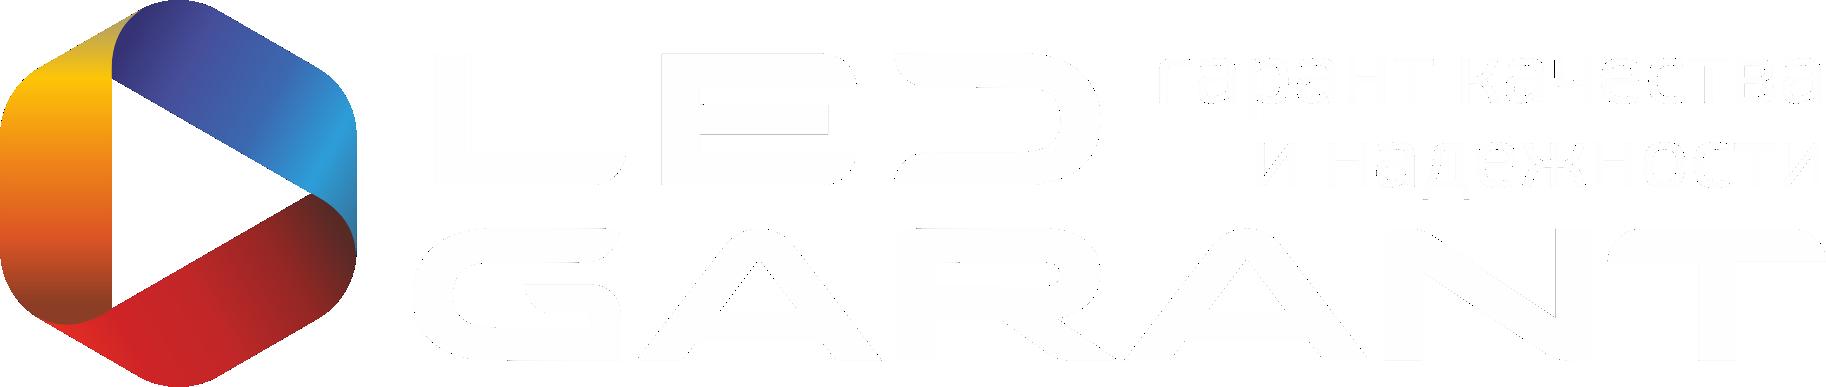 Led-Garant